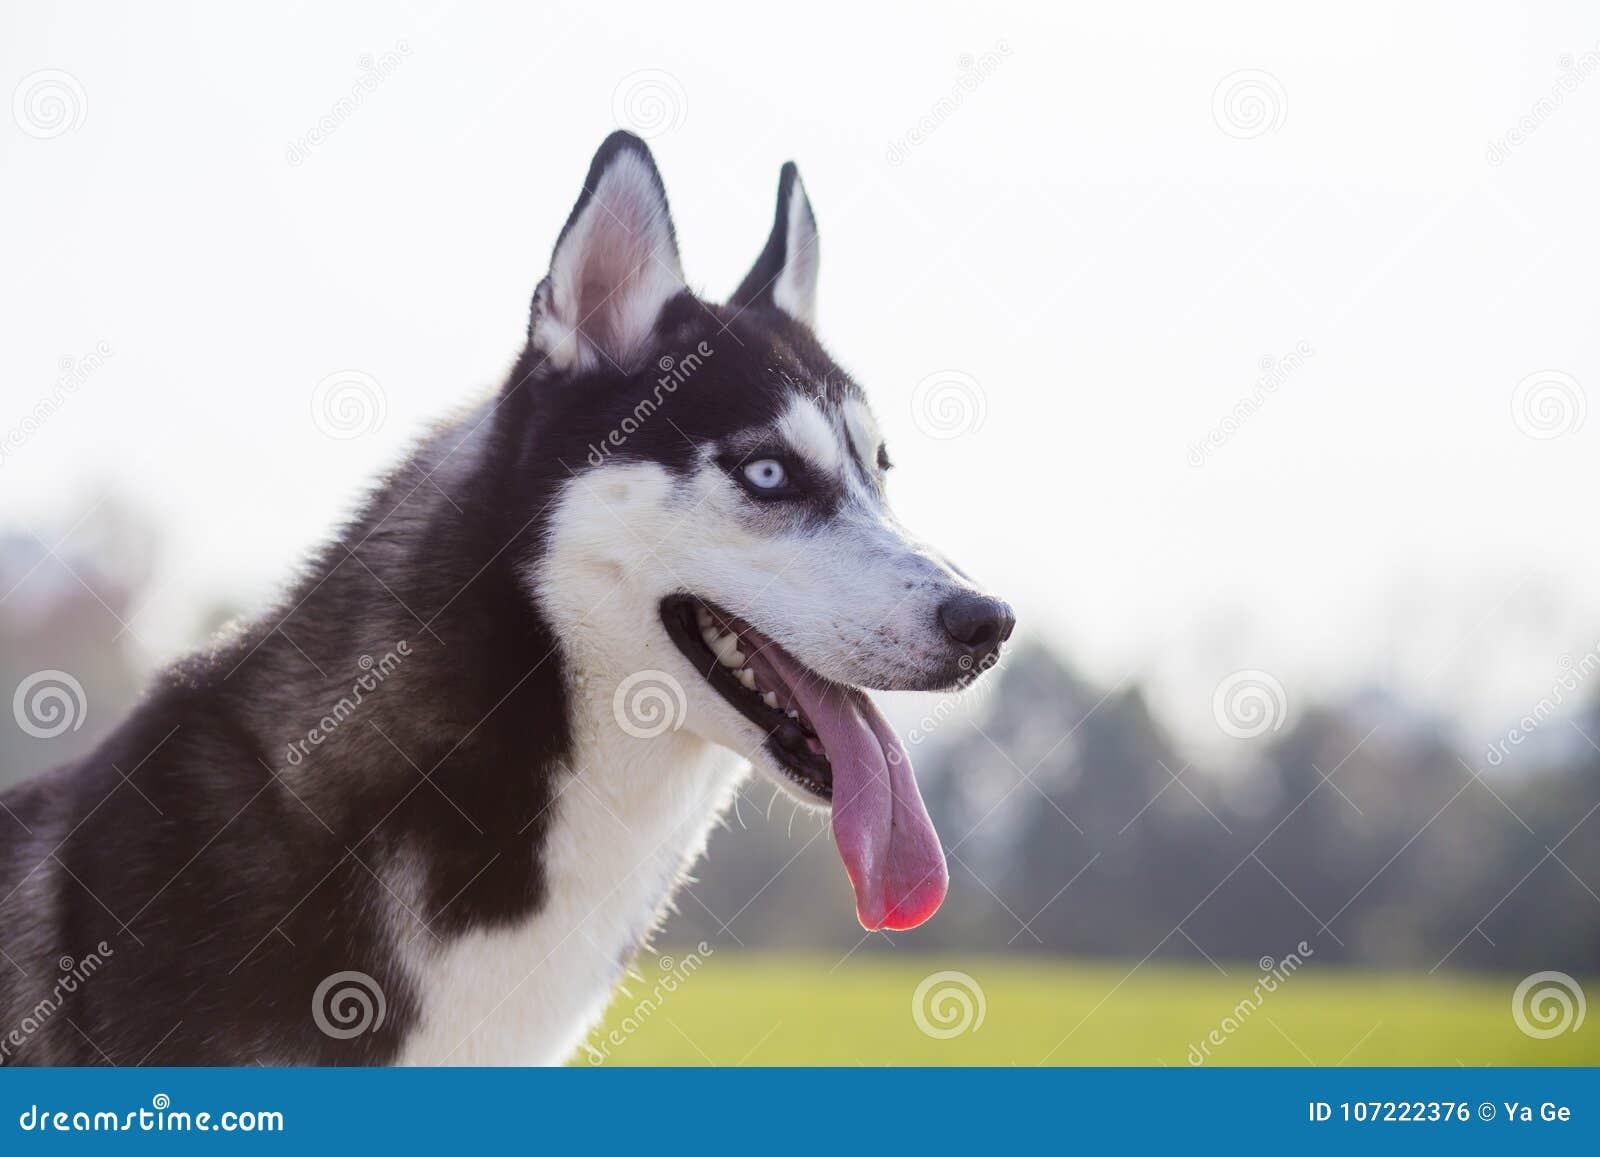 Siberian Husky Dog Stock Photo Image Of Silly Outdoor 107222376